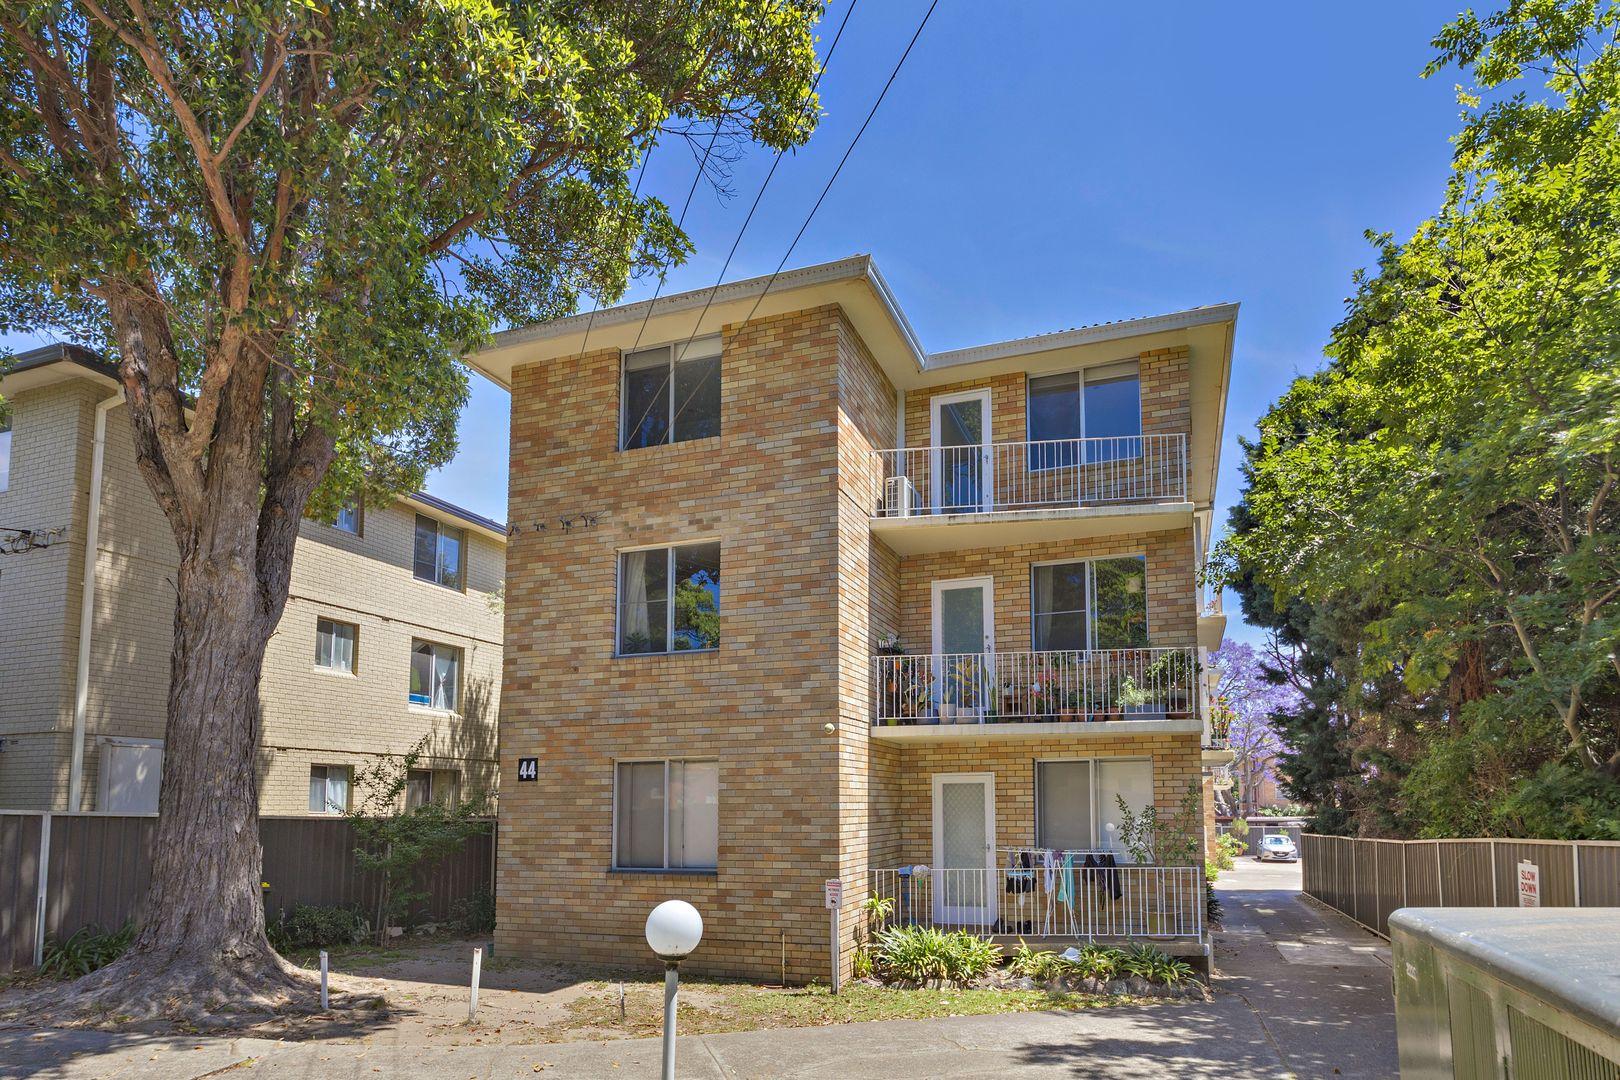 4/44 Orpington Street, Ashfield NSW 2131, Image 0